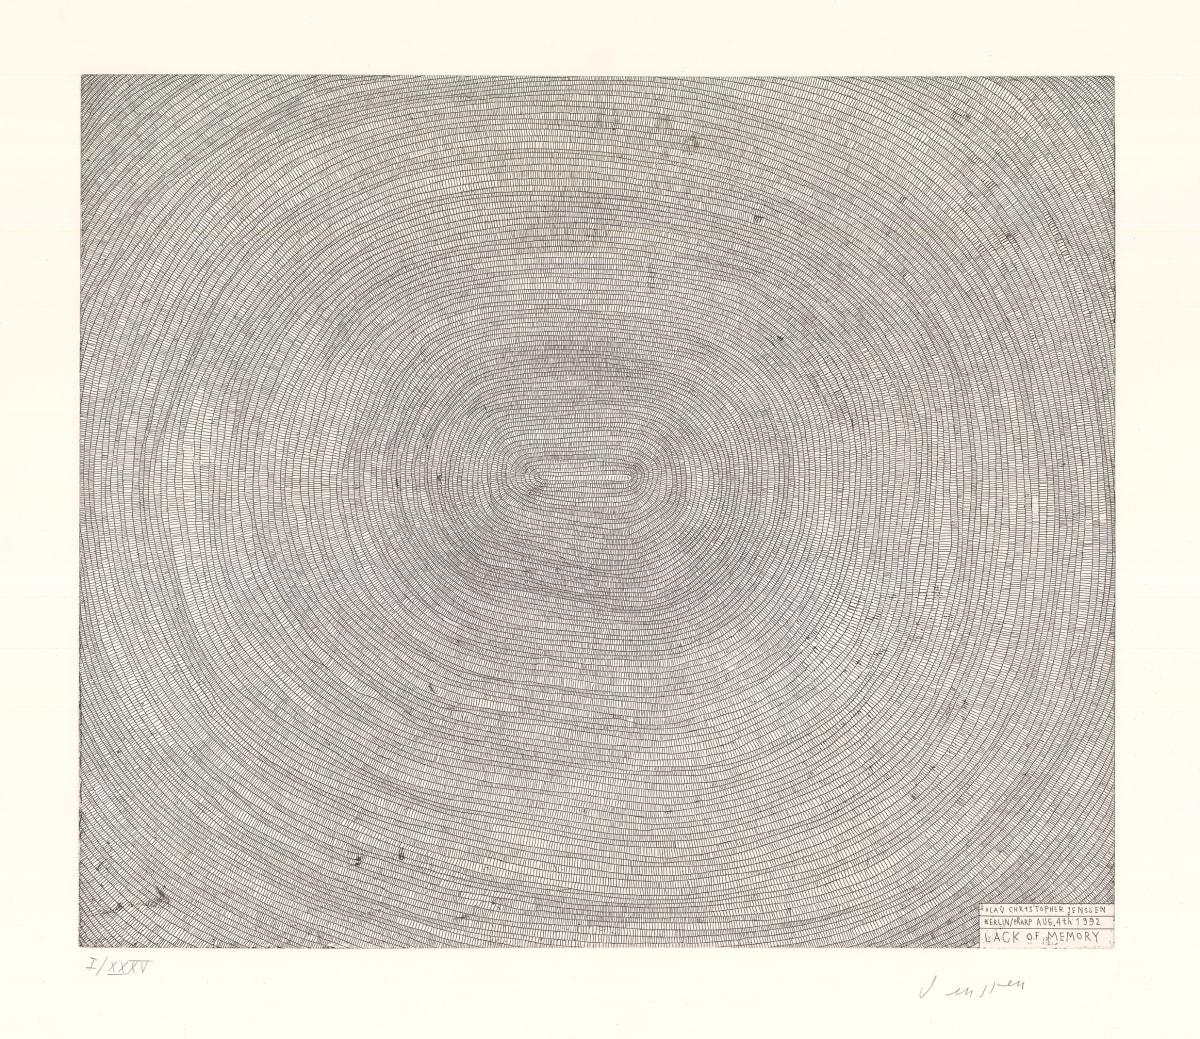 Olav Christopher Jenssen Lack of Memory, 1992 Etching 63 x 75